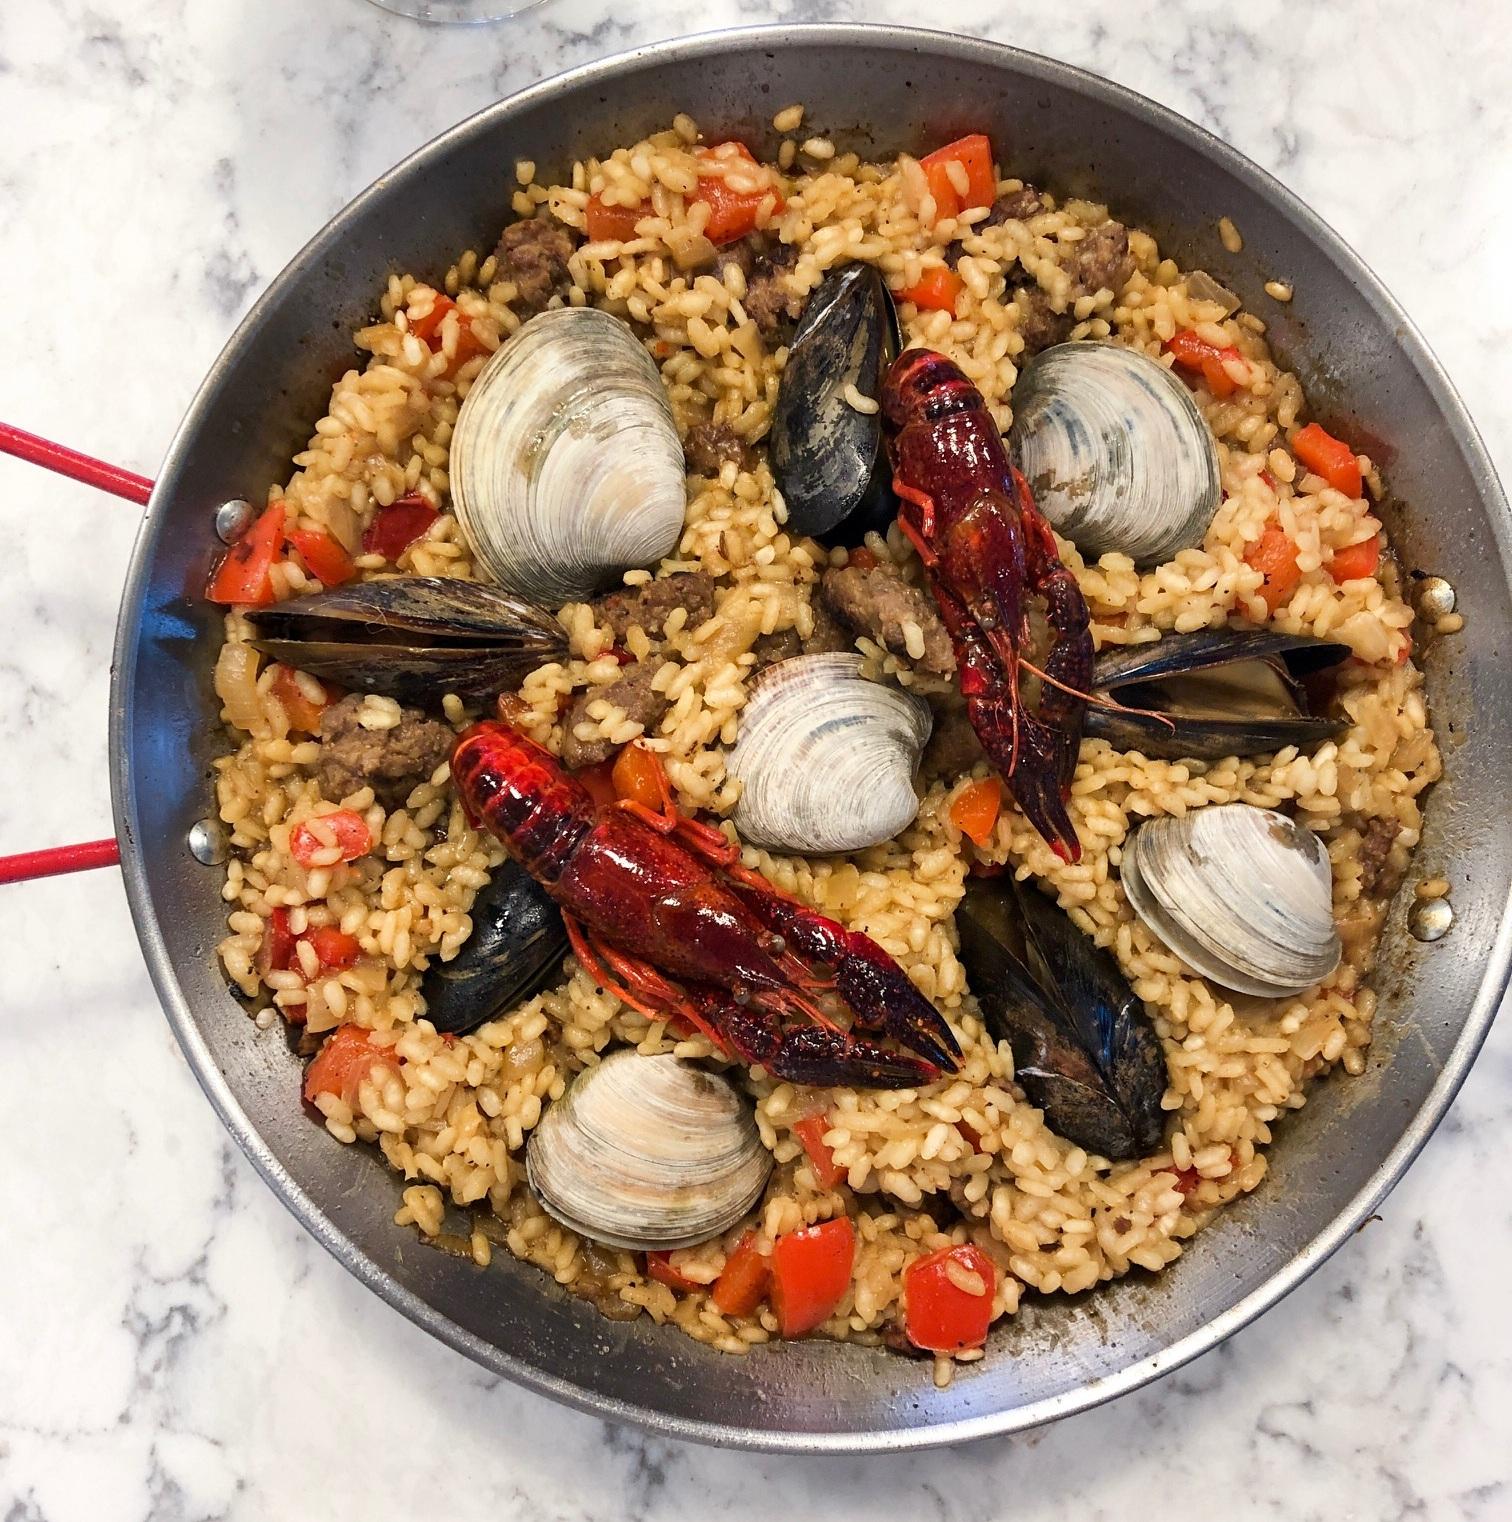 Chorizo+and+Seafood+Paella